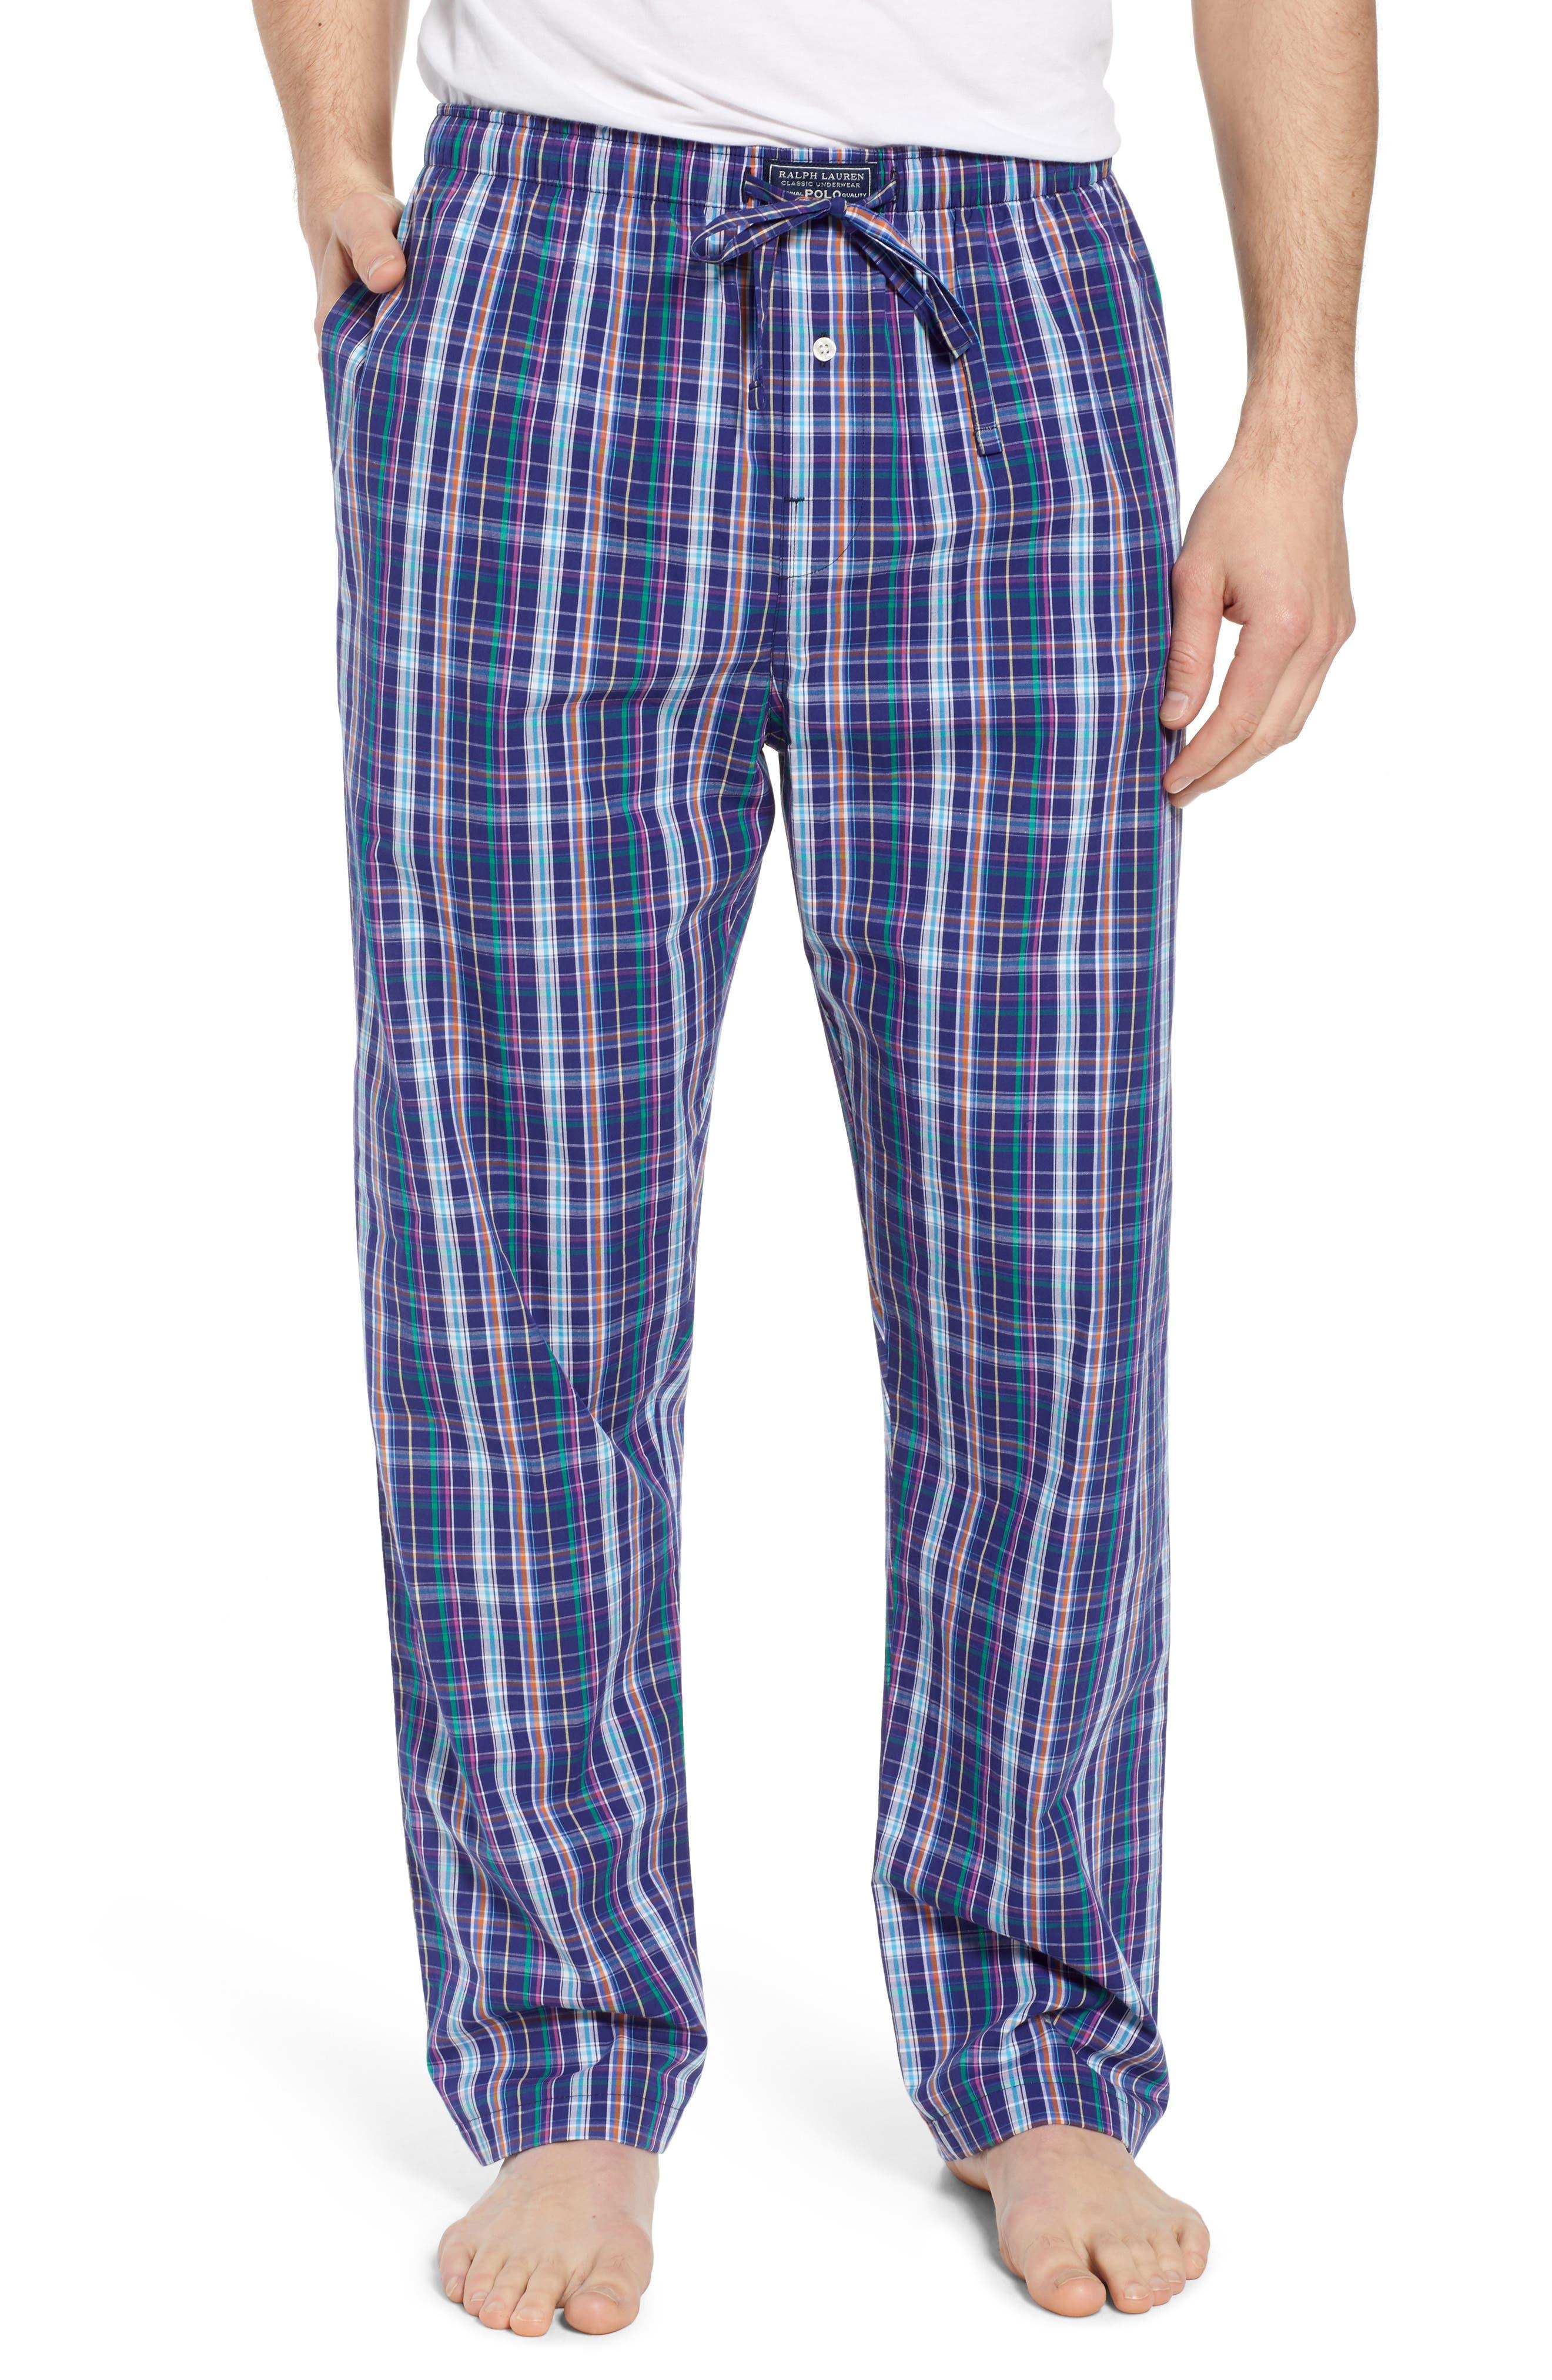 Cotton Lounge Pants,                             Main thumbnail 1, color,                             Alton Plaid/ May Orange